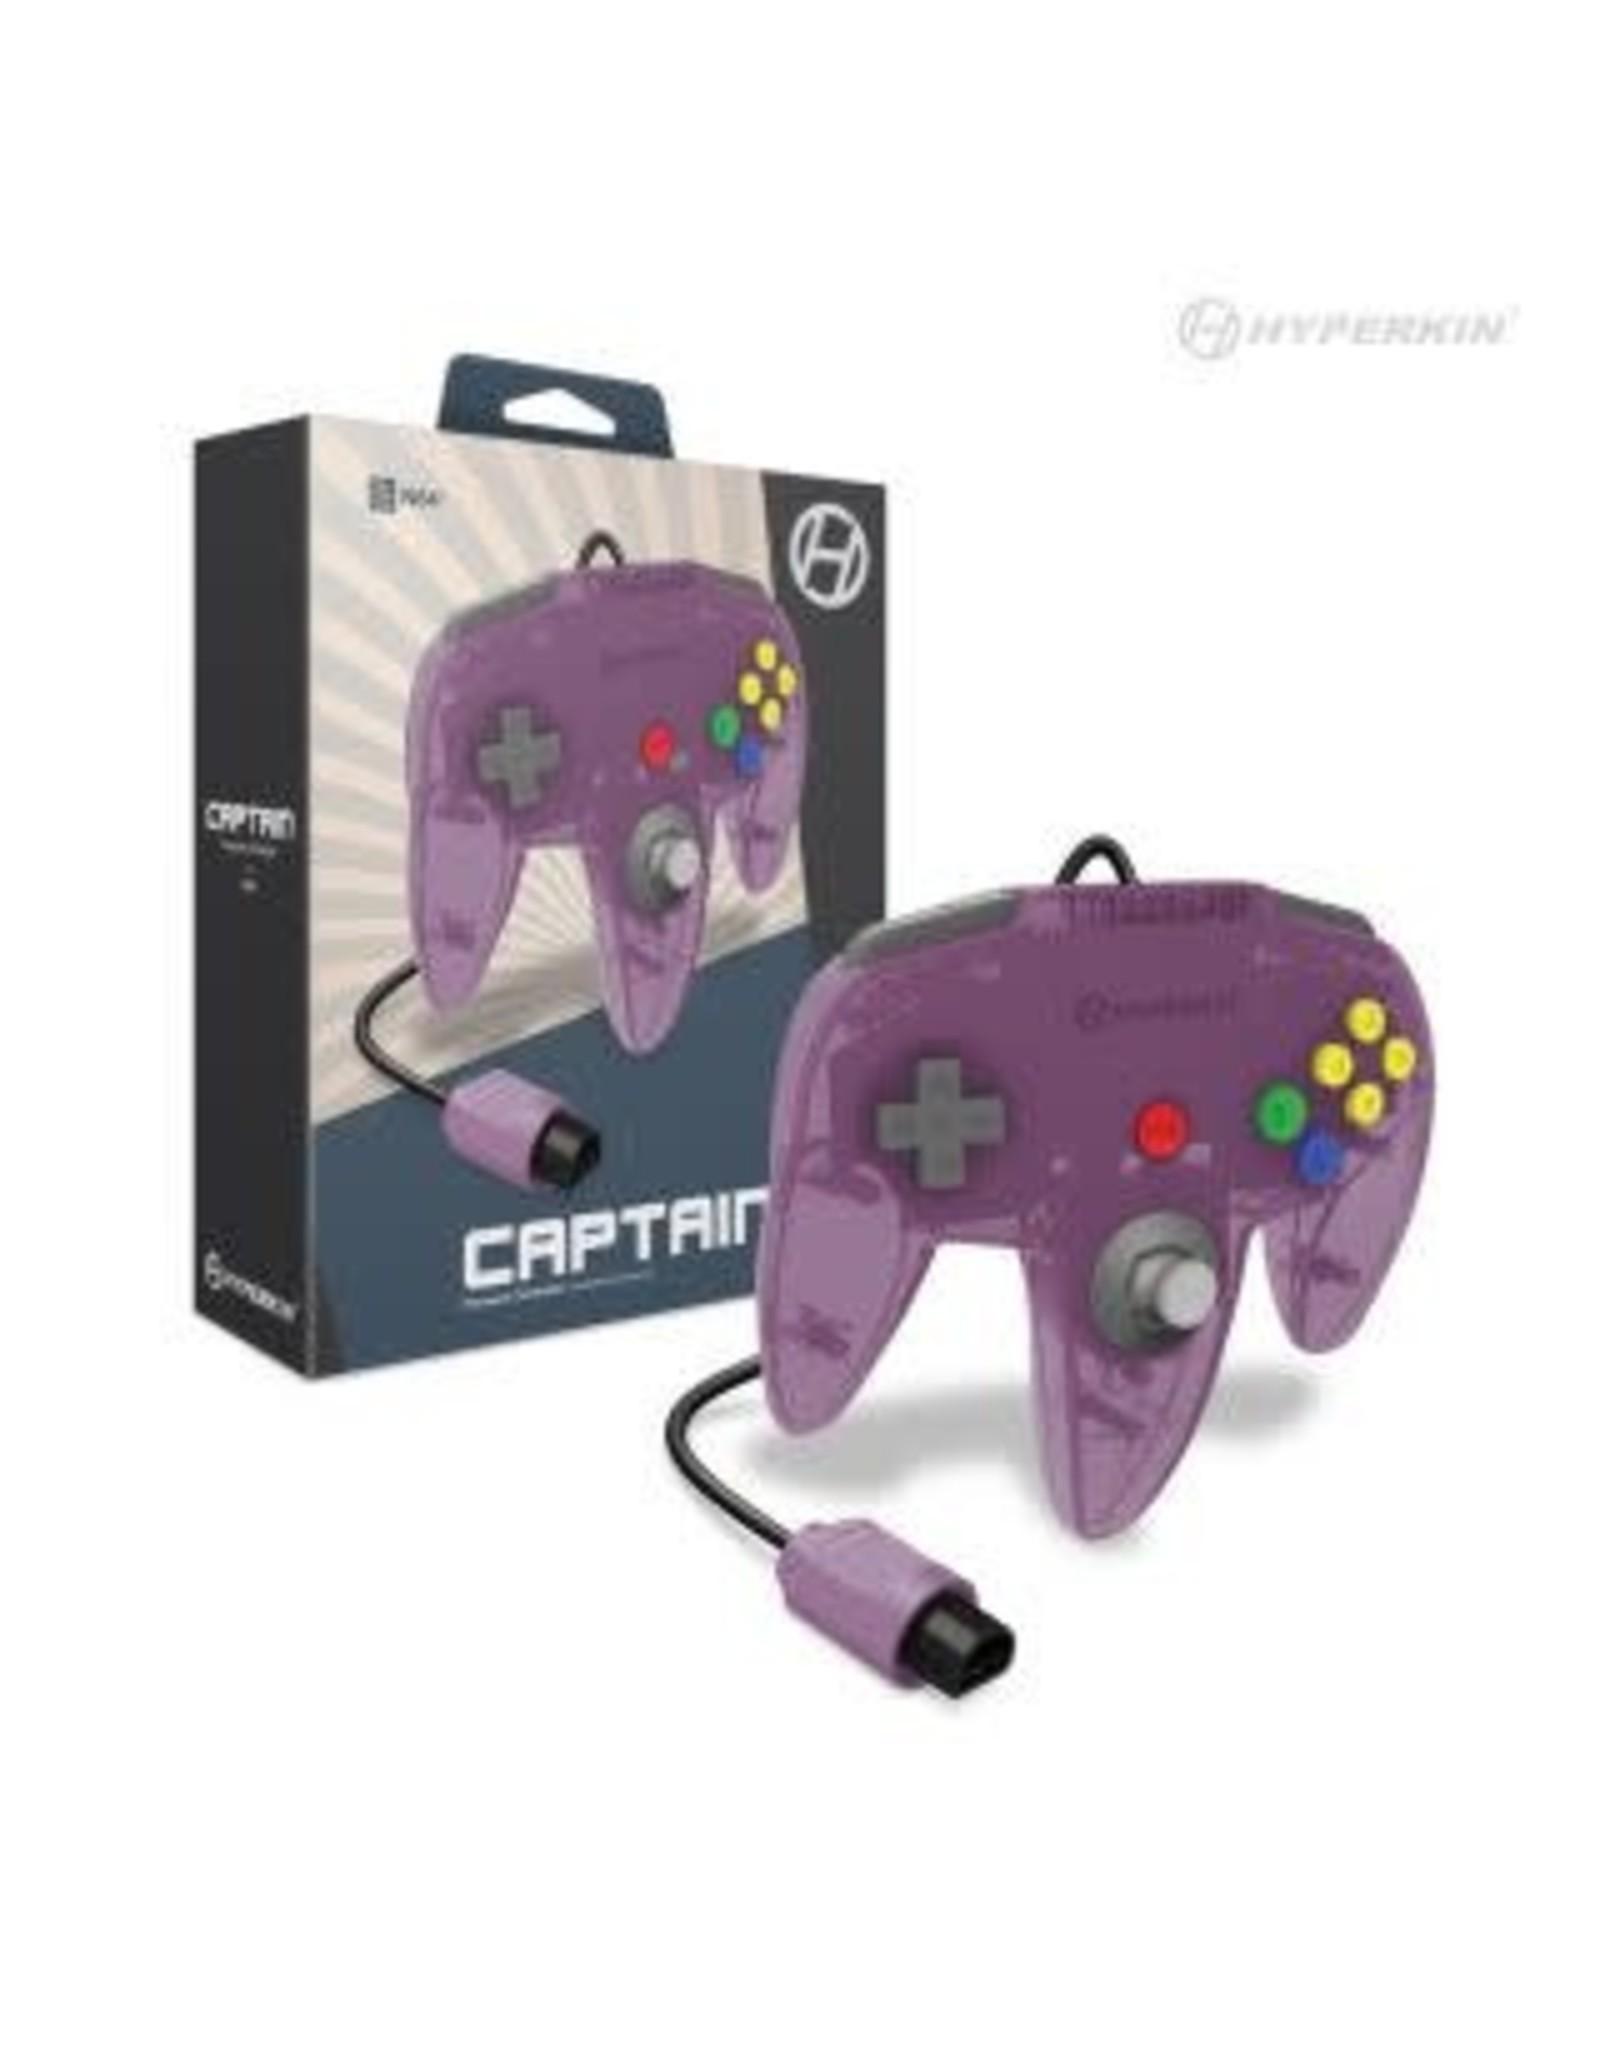 """Captain"" Premium Controller For N64® (Amethyst Purple) - Hyperkin"